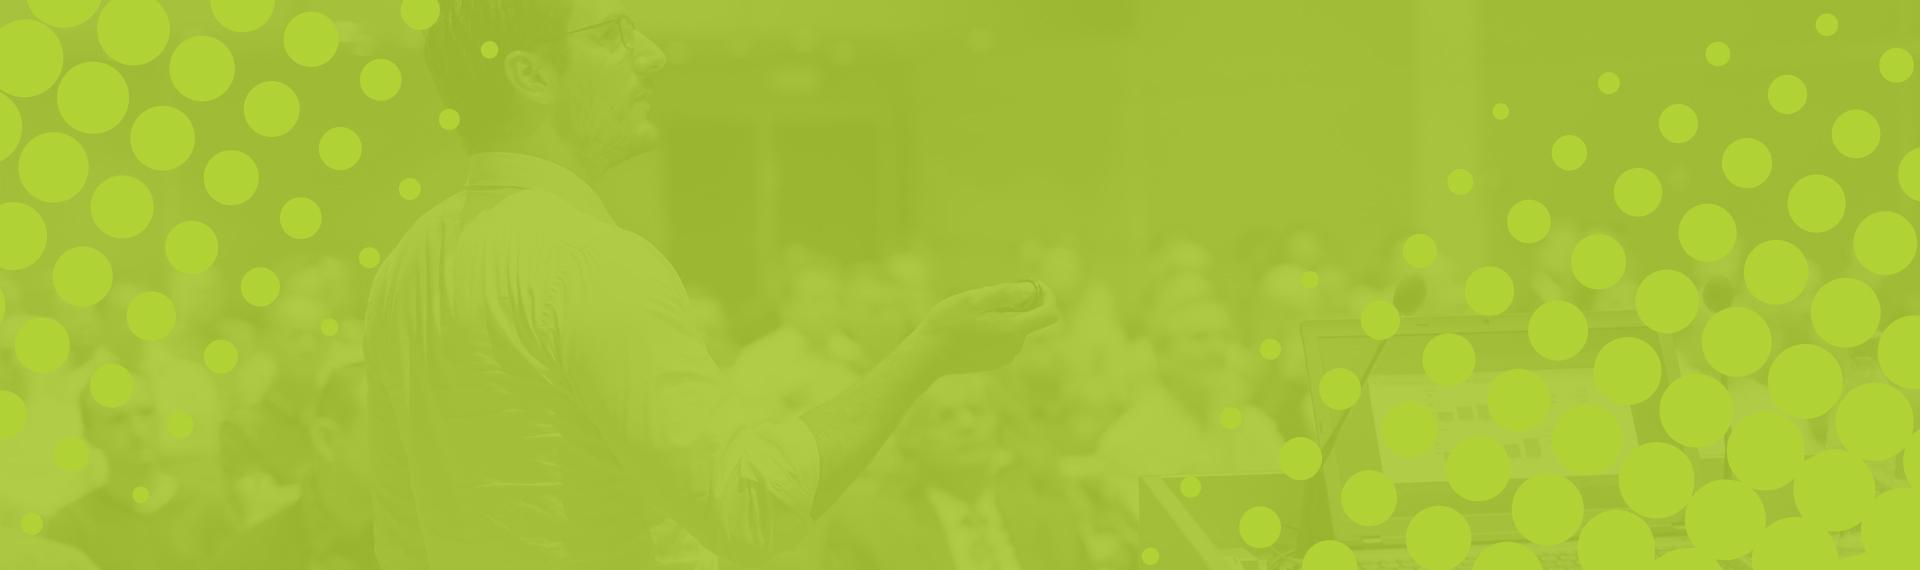 Brandall Agency Professional Presentation Slides Web Page